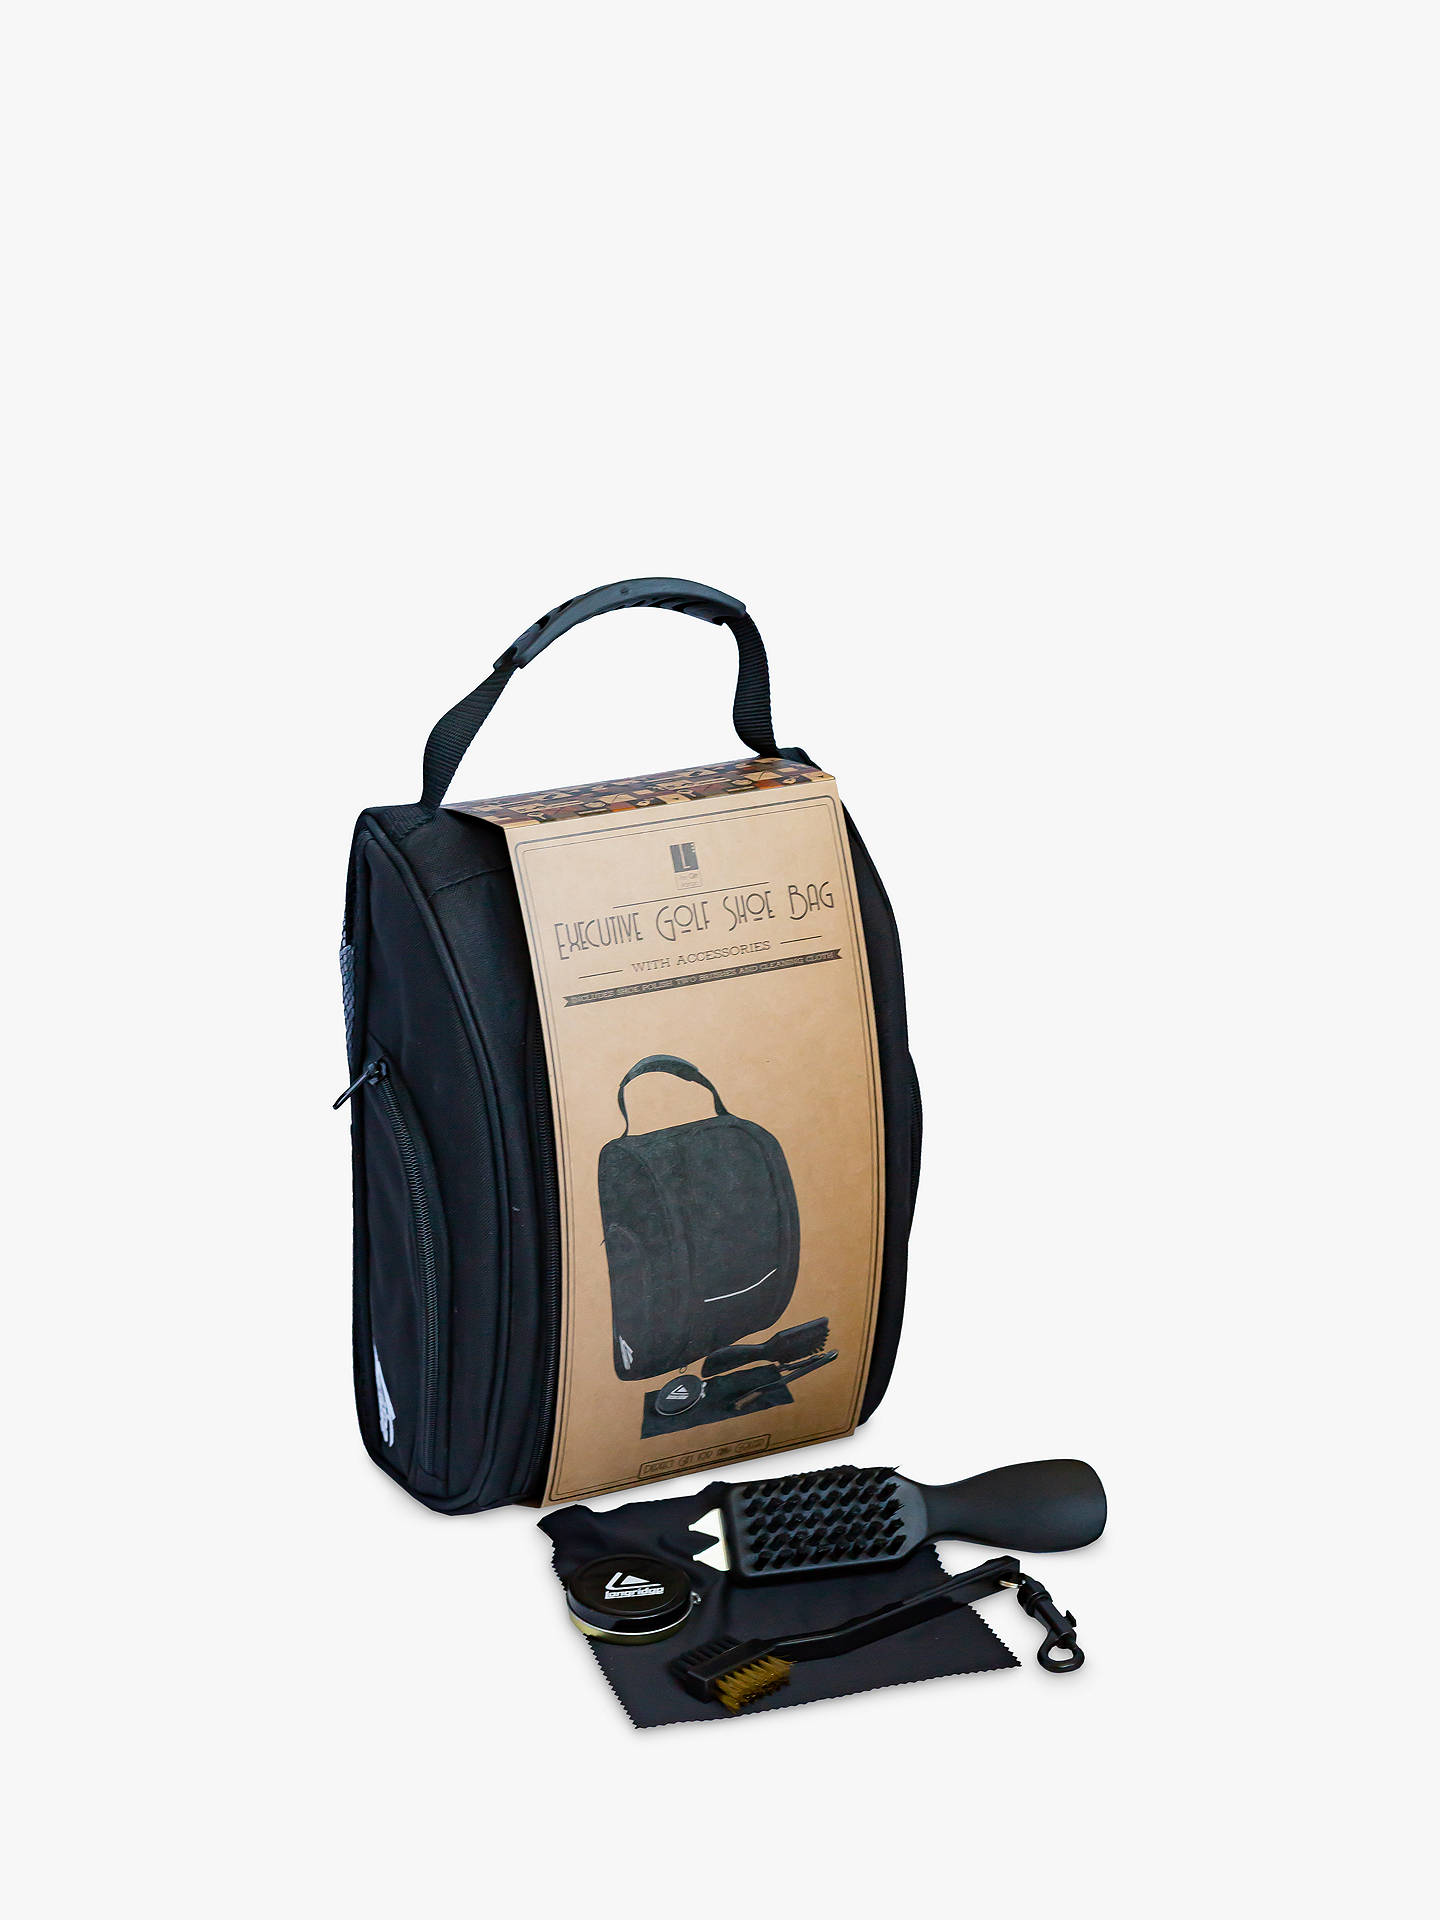 9abc2c83e738 BuyLongridge Executive Golf Shoe Bag and Accessories Set Online at  johnlewis.com ...